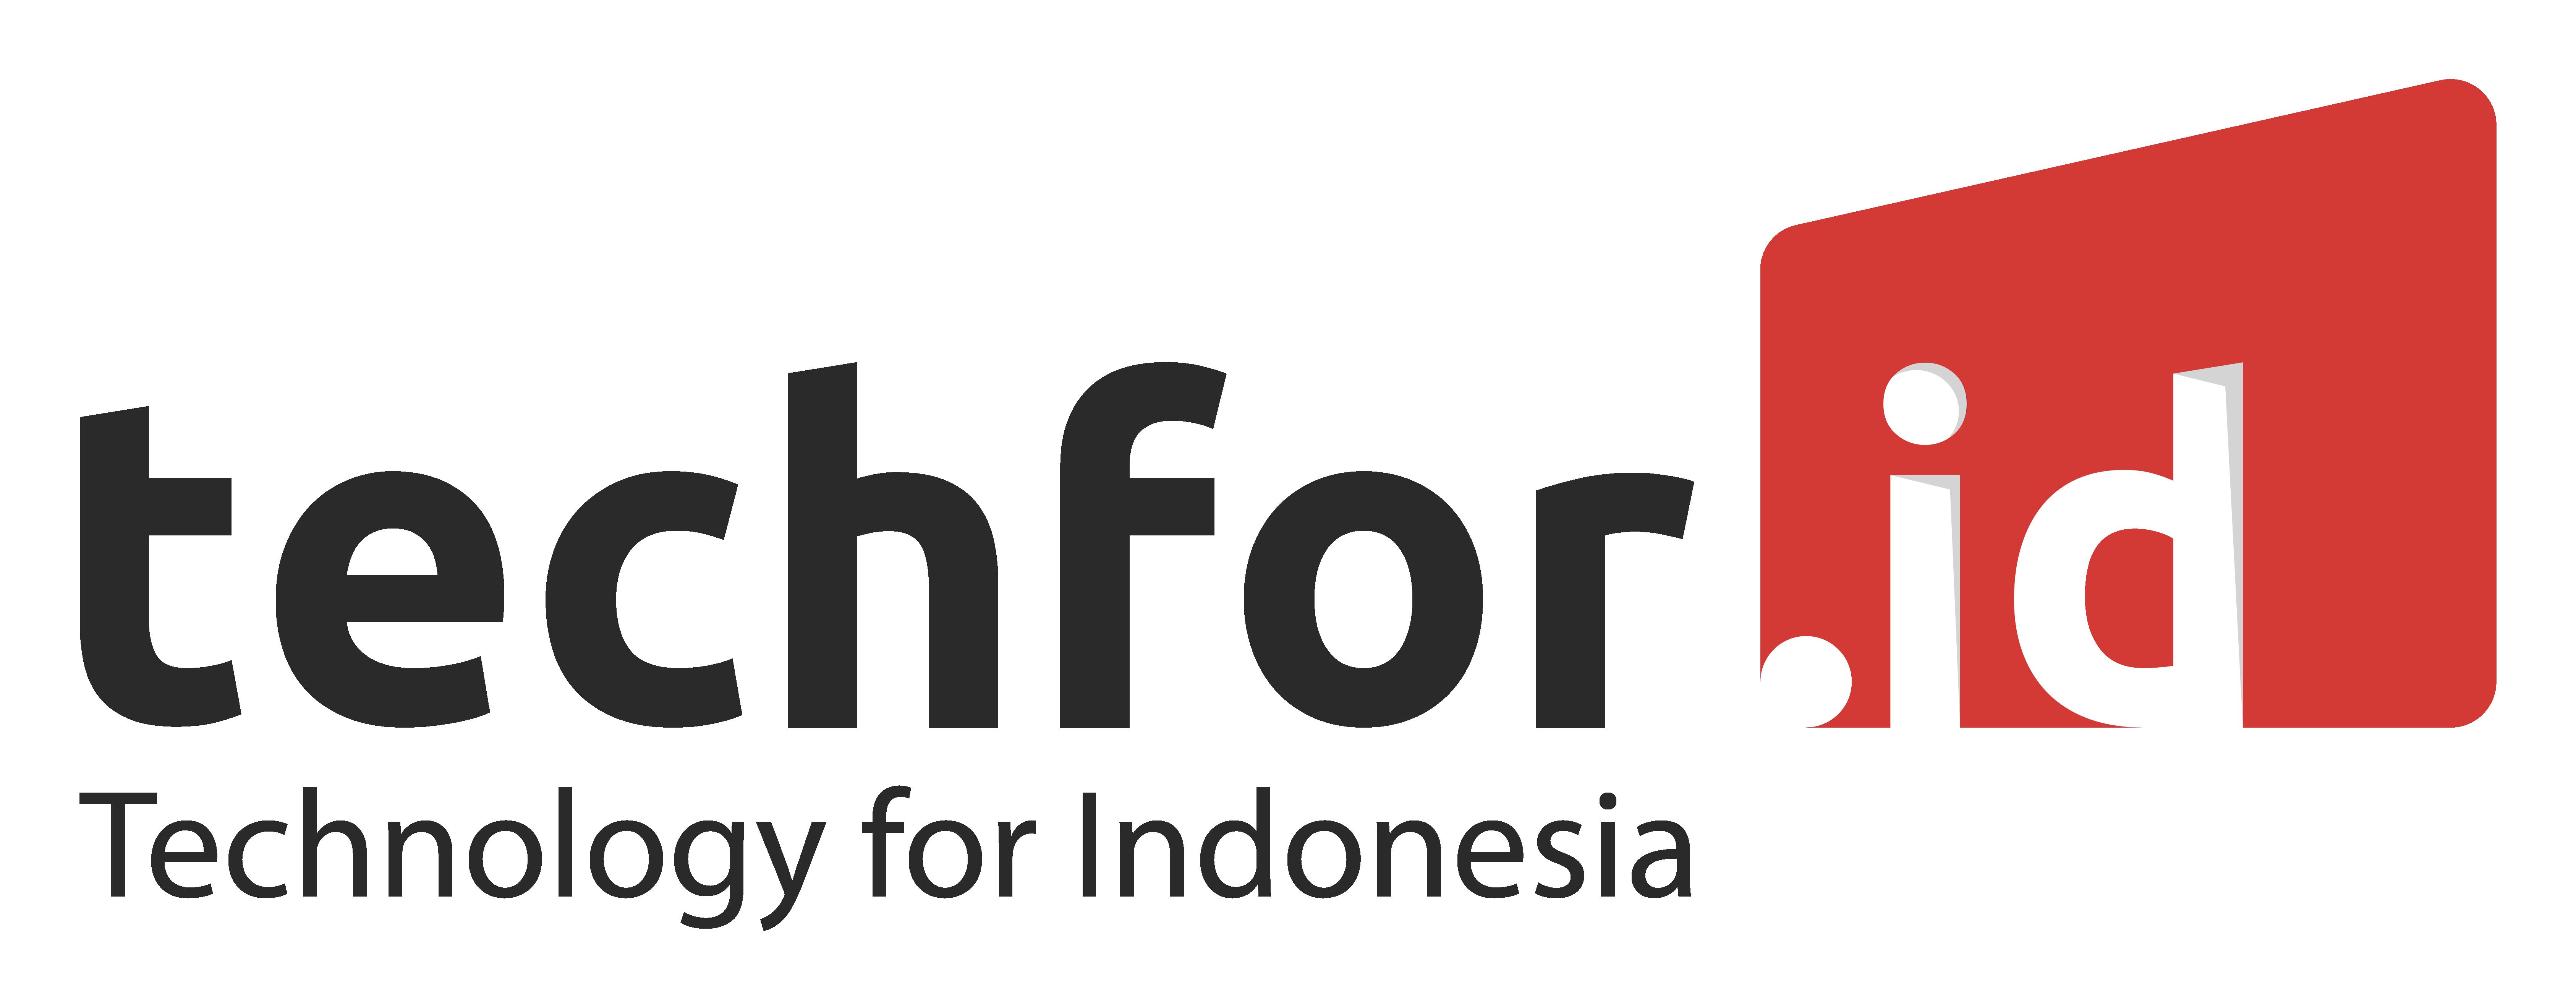 techfor.id